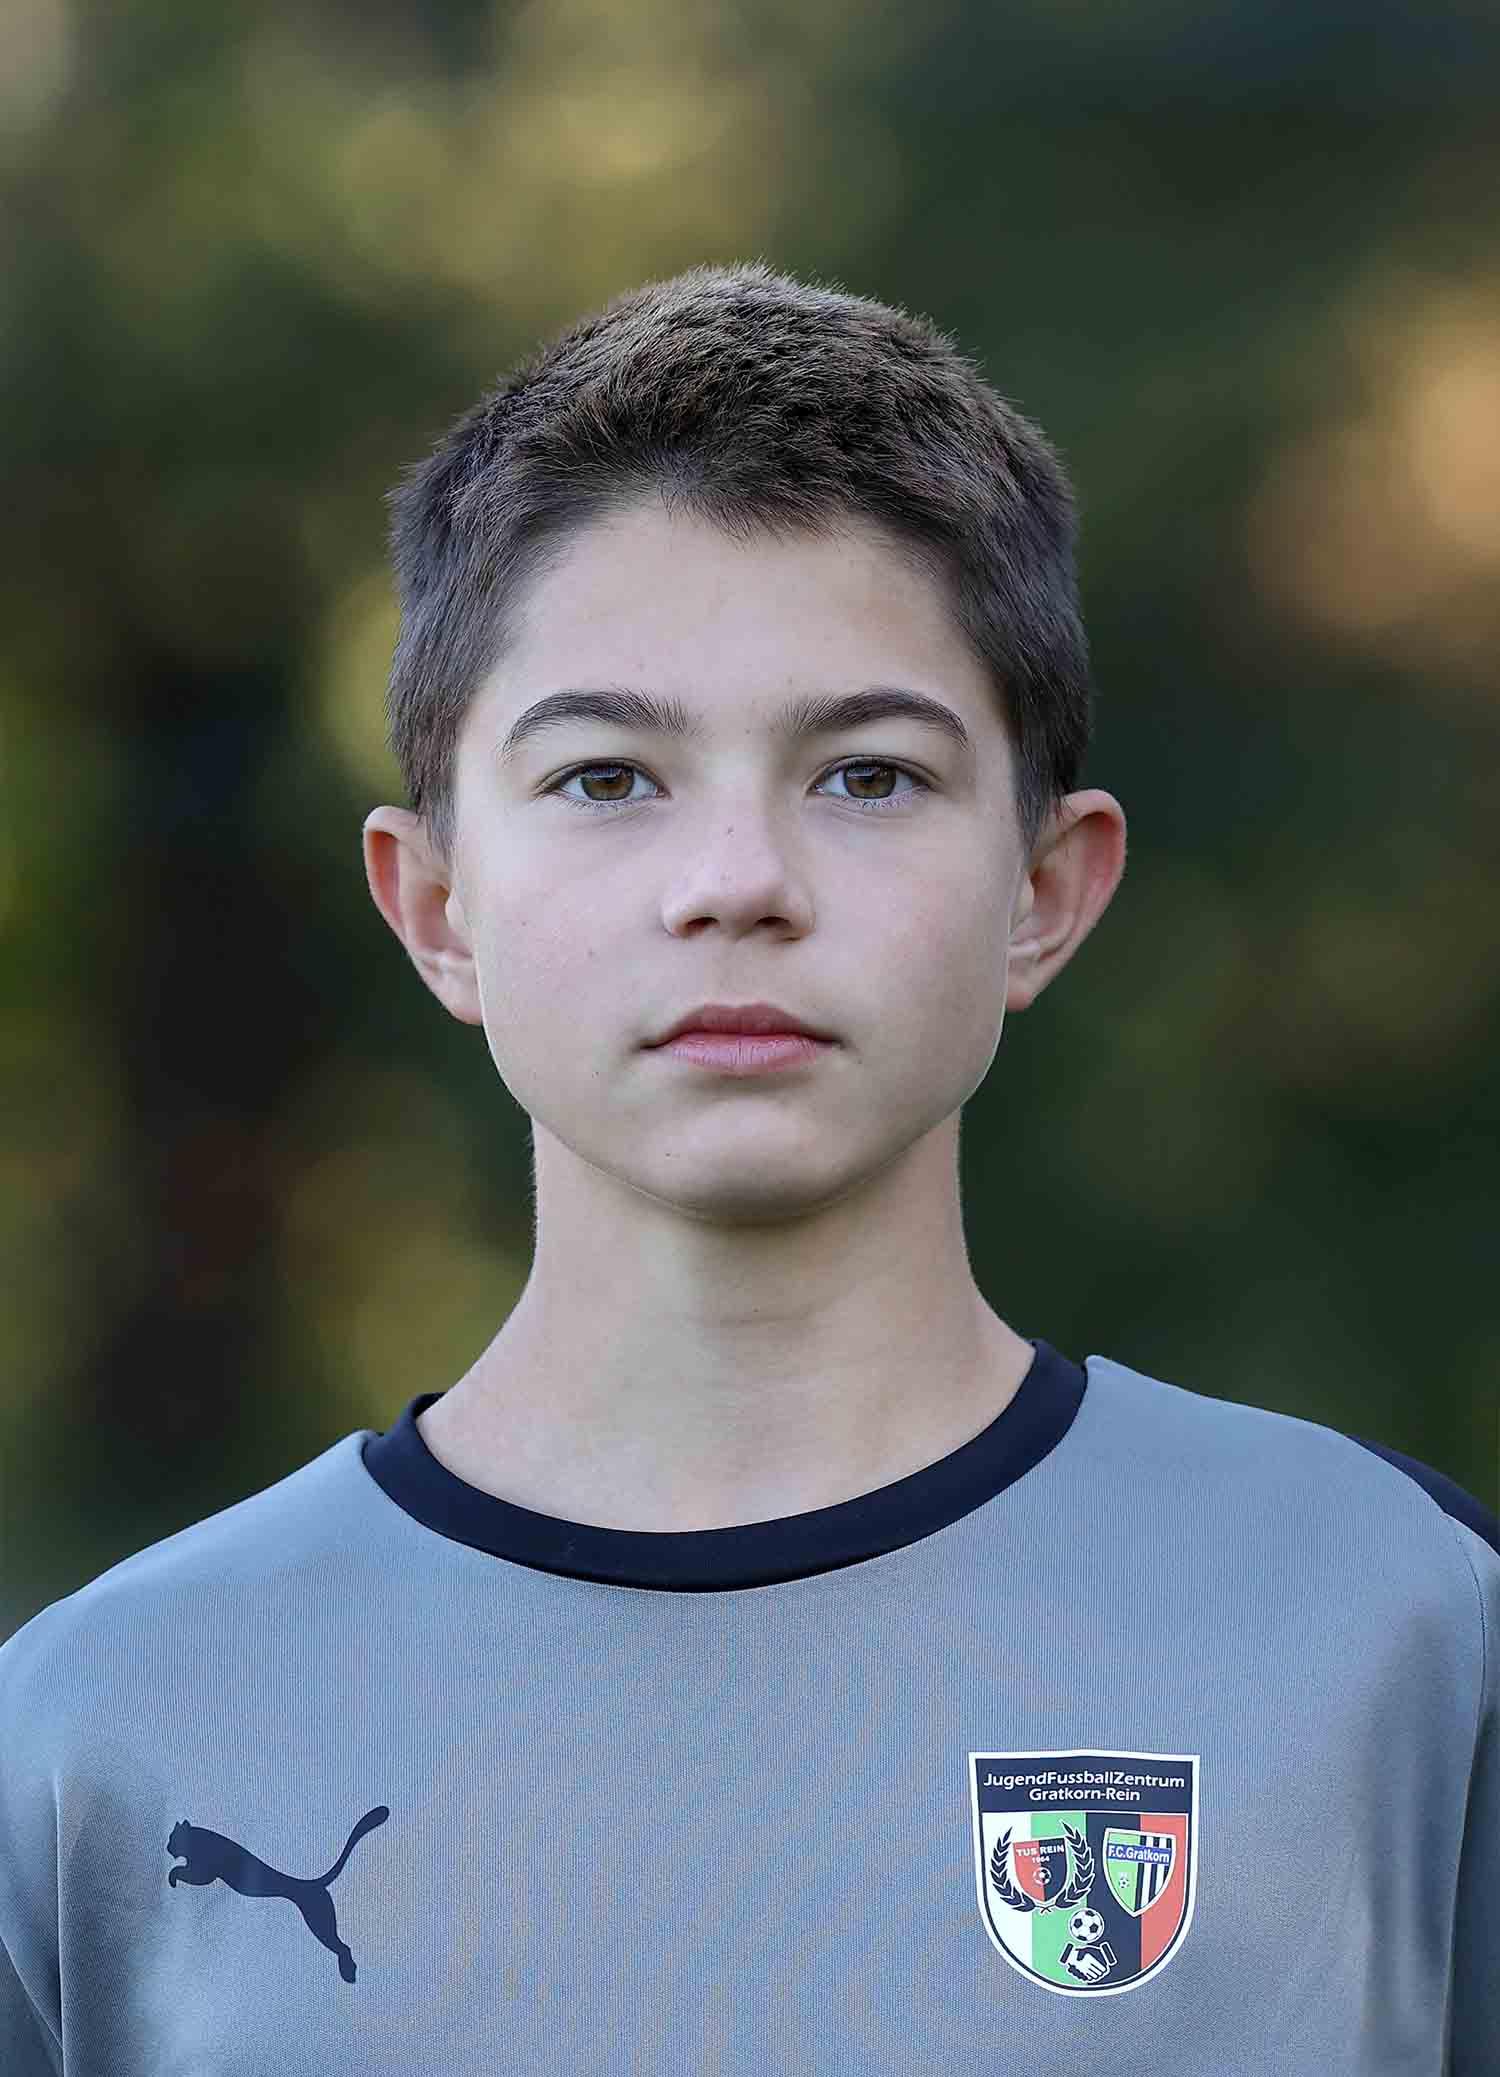 Noah Puntigam, FC Gratkorn U15